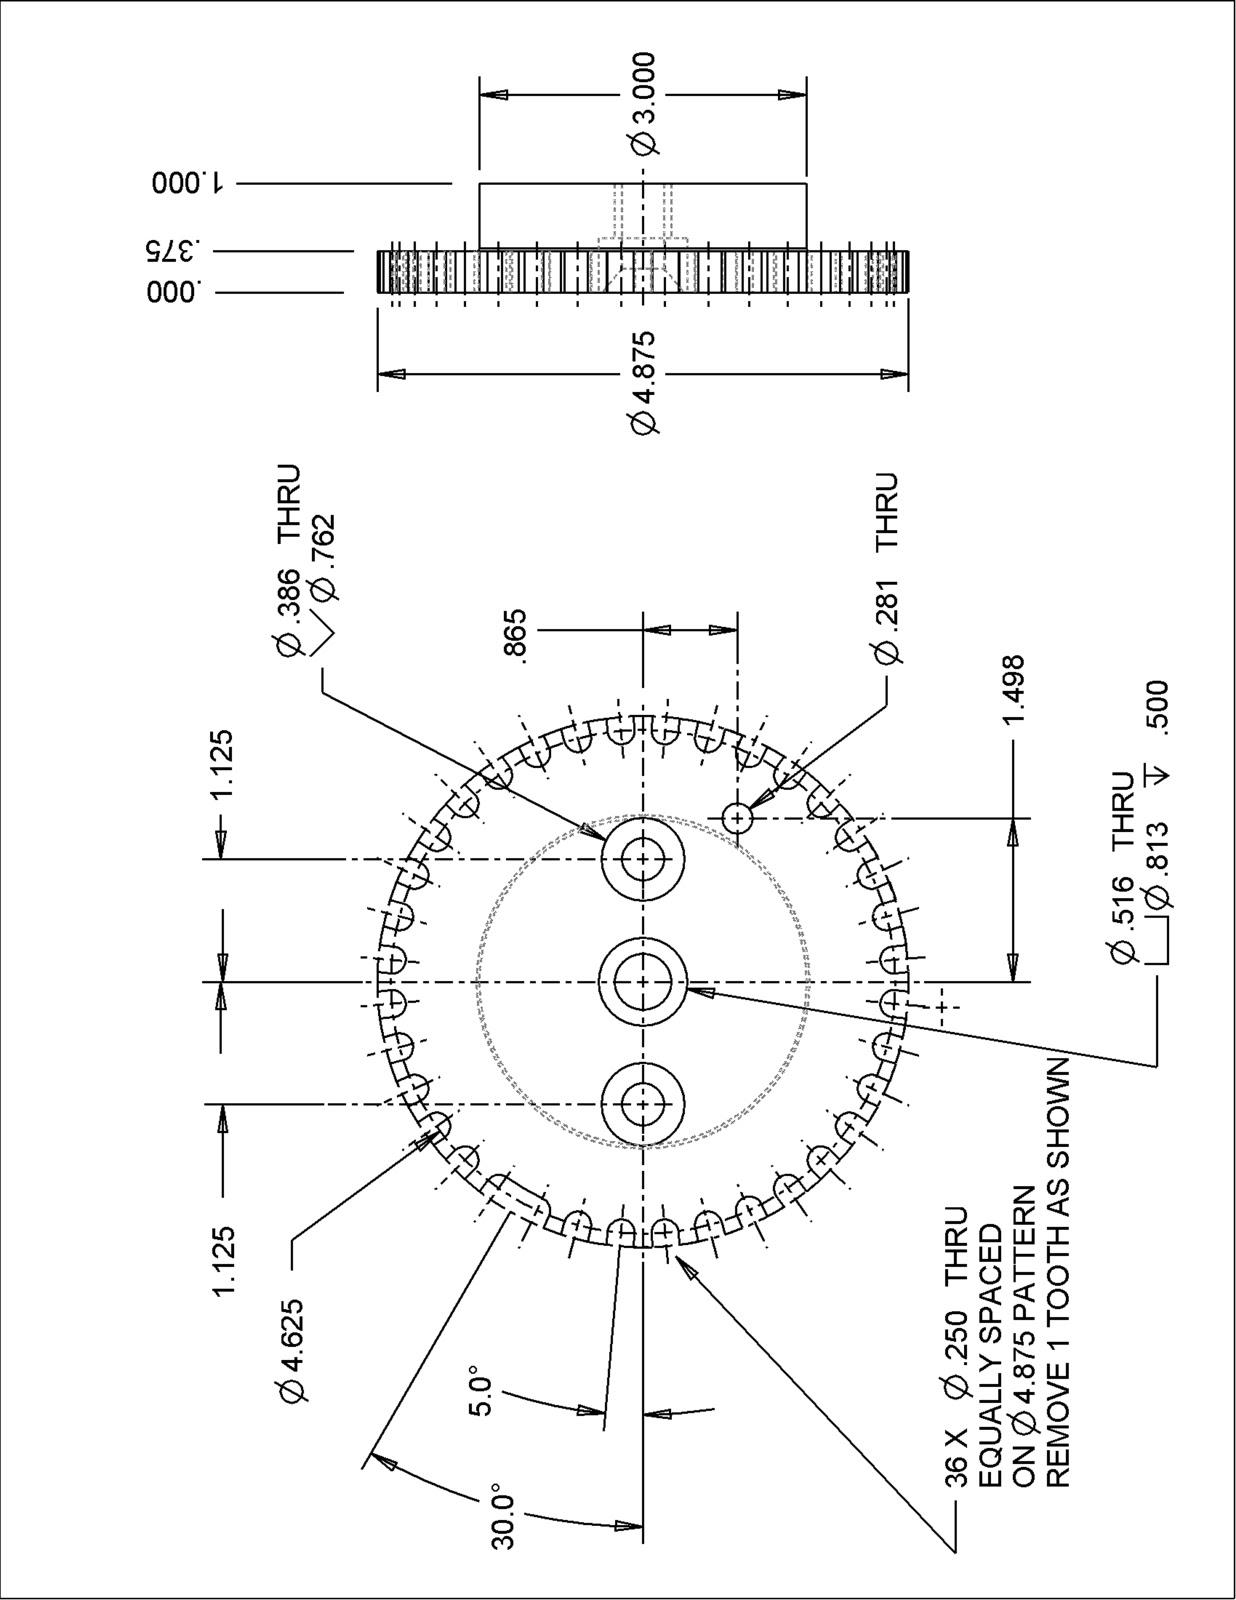 Megajolt - Auto Electrical Wiring Diagram